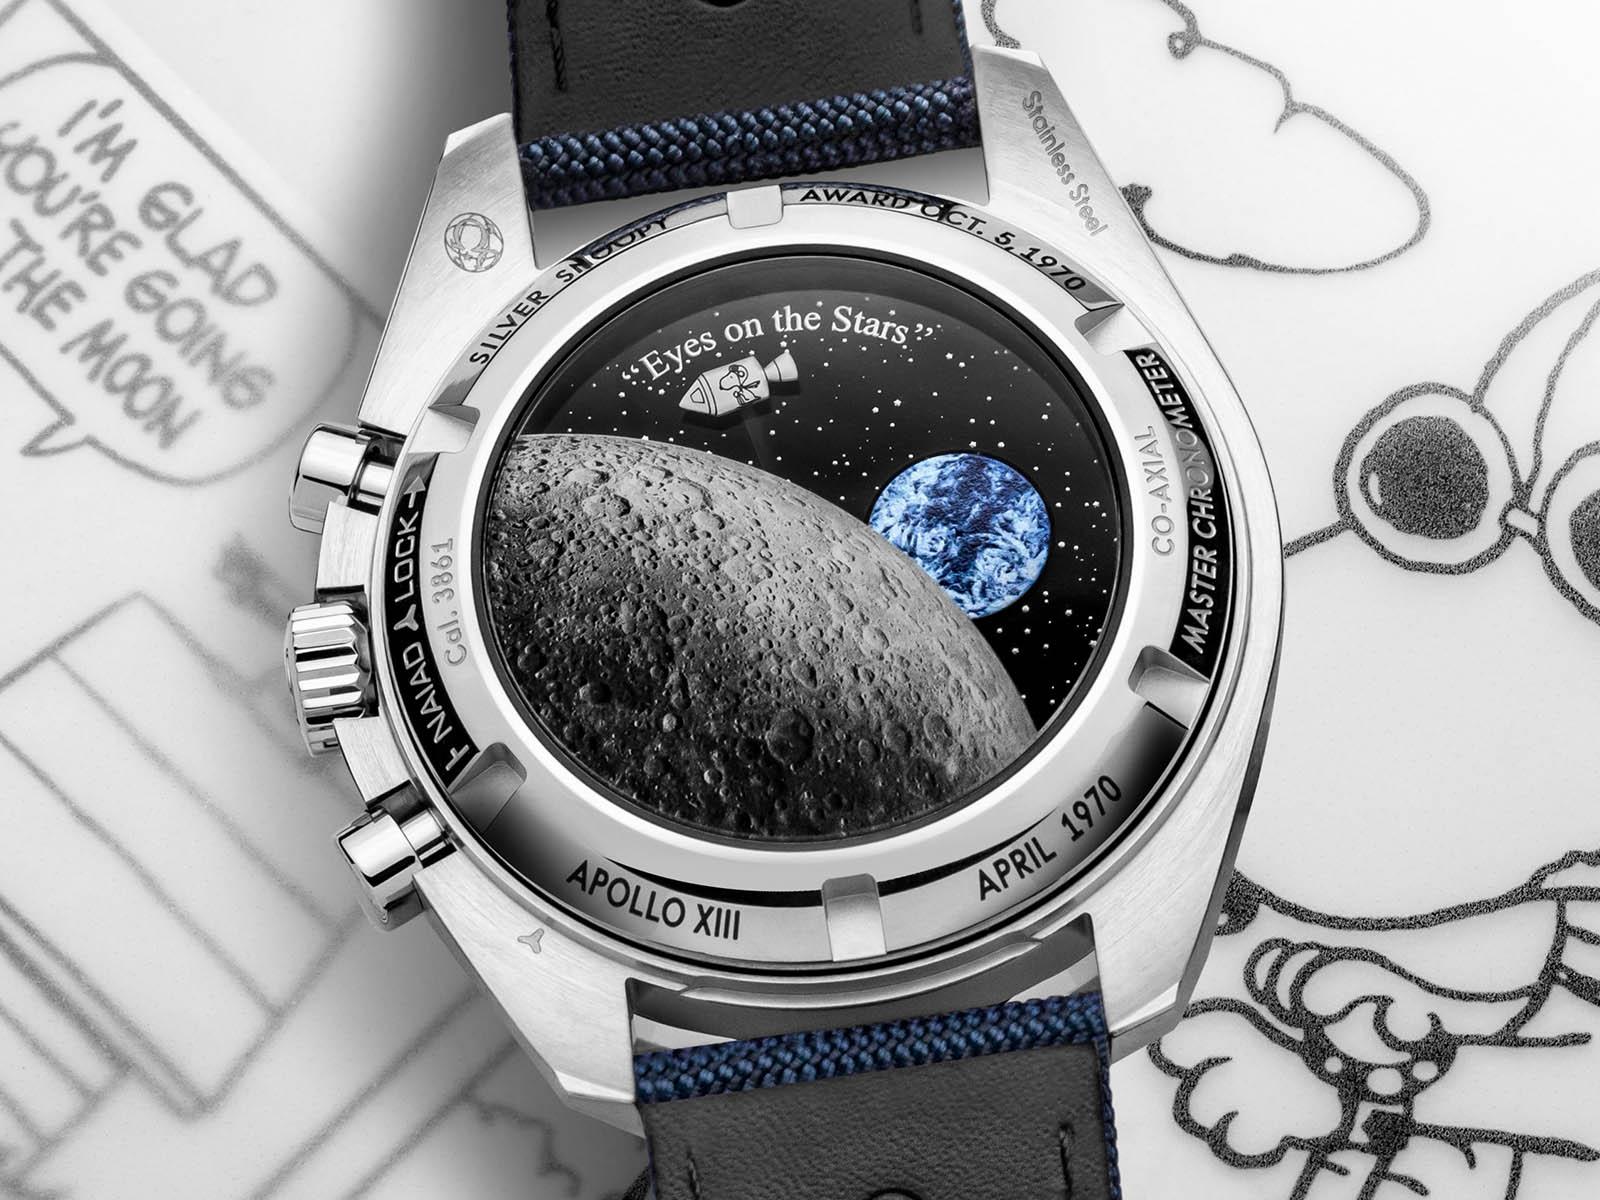 310-32-42-50-02-001-omega-speedmaster-silver-snoopy-award-50th-anniversary-5.jpg